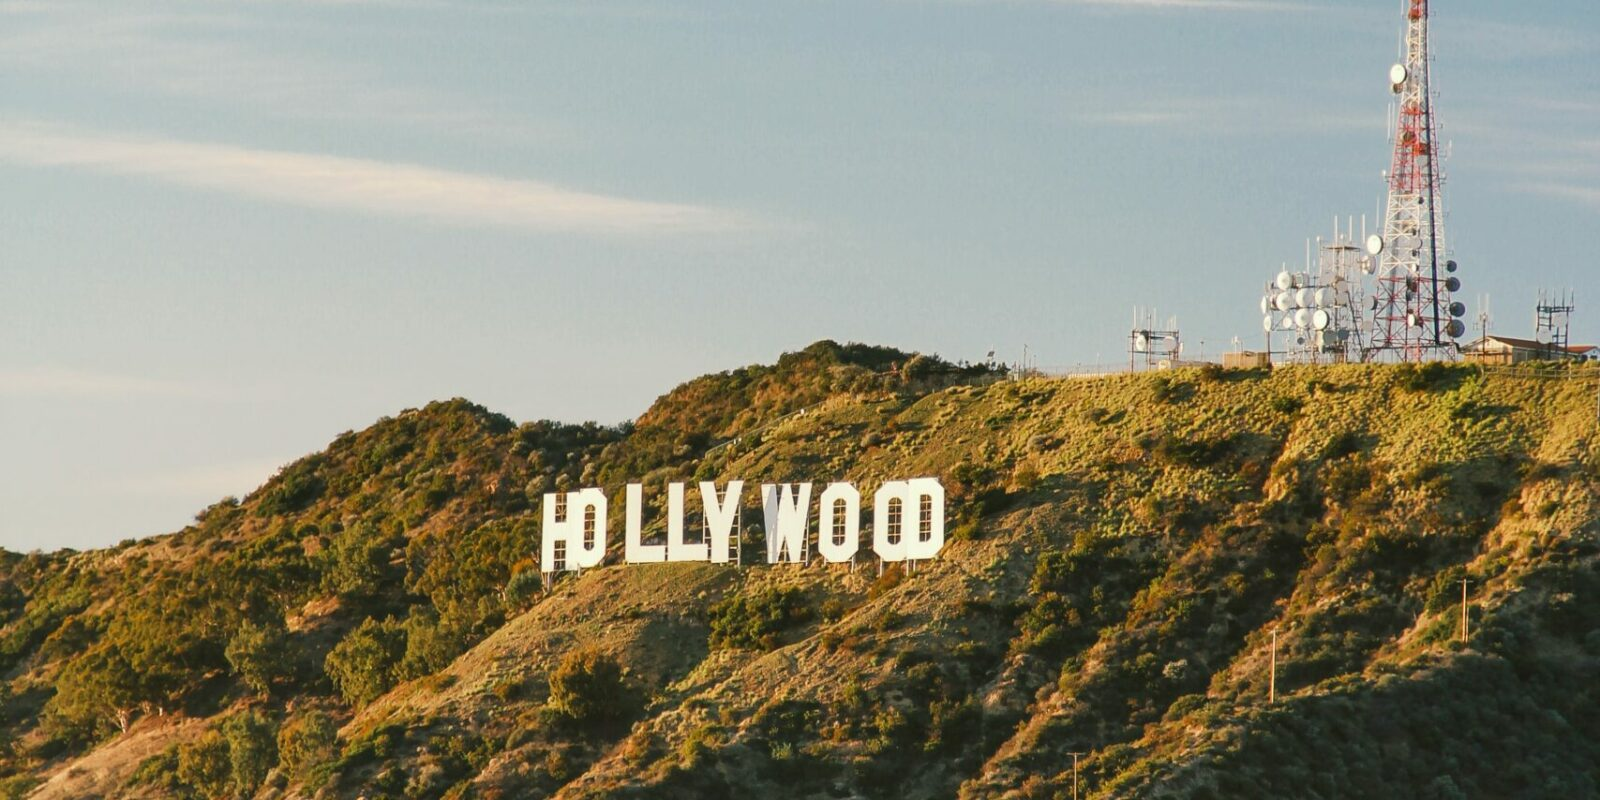 Hollywood Sign. Photo by Gabriel Santiago (https://unsplash.com/photos/VJ5i5ARz6jc)